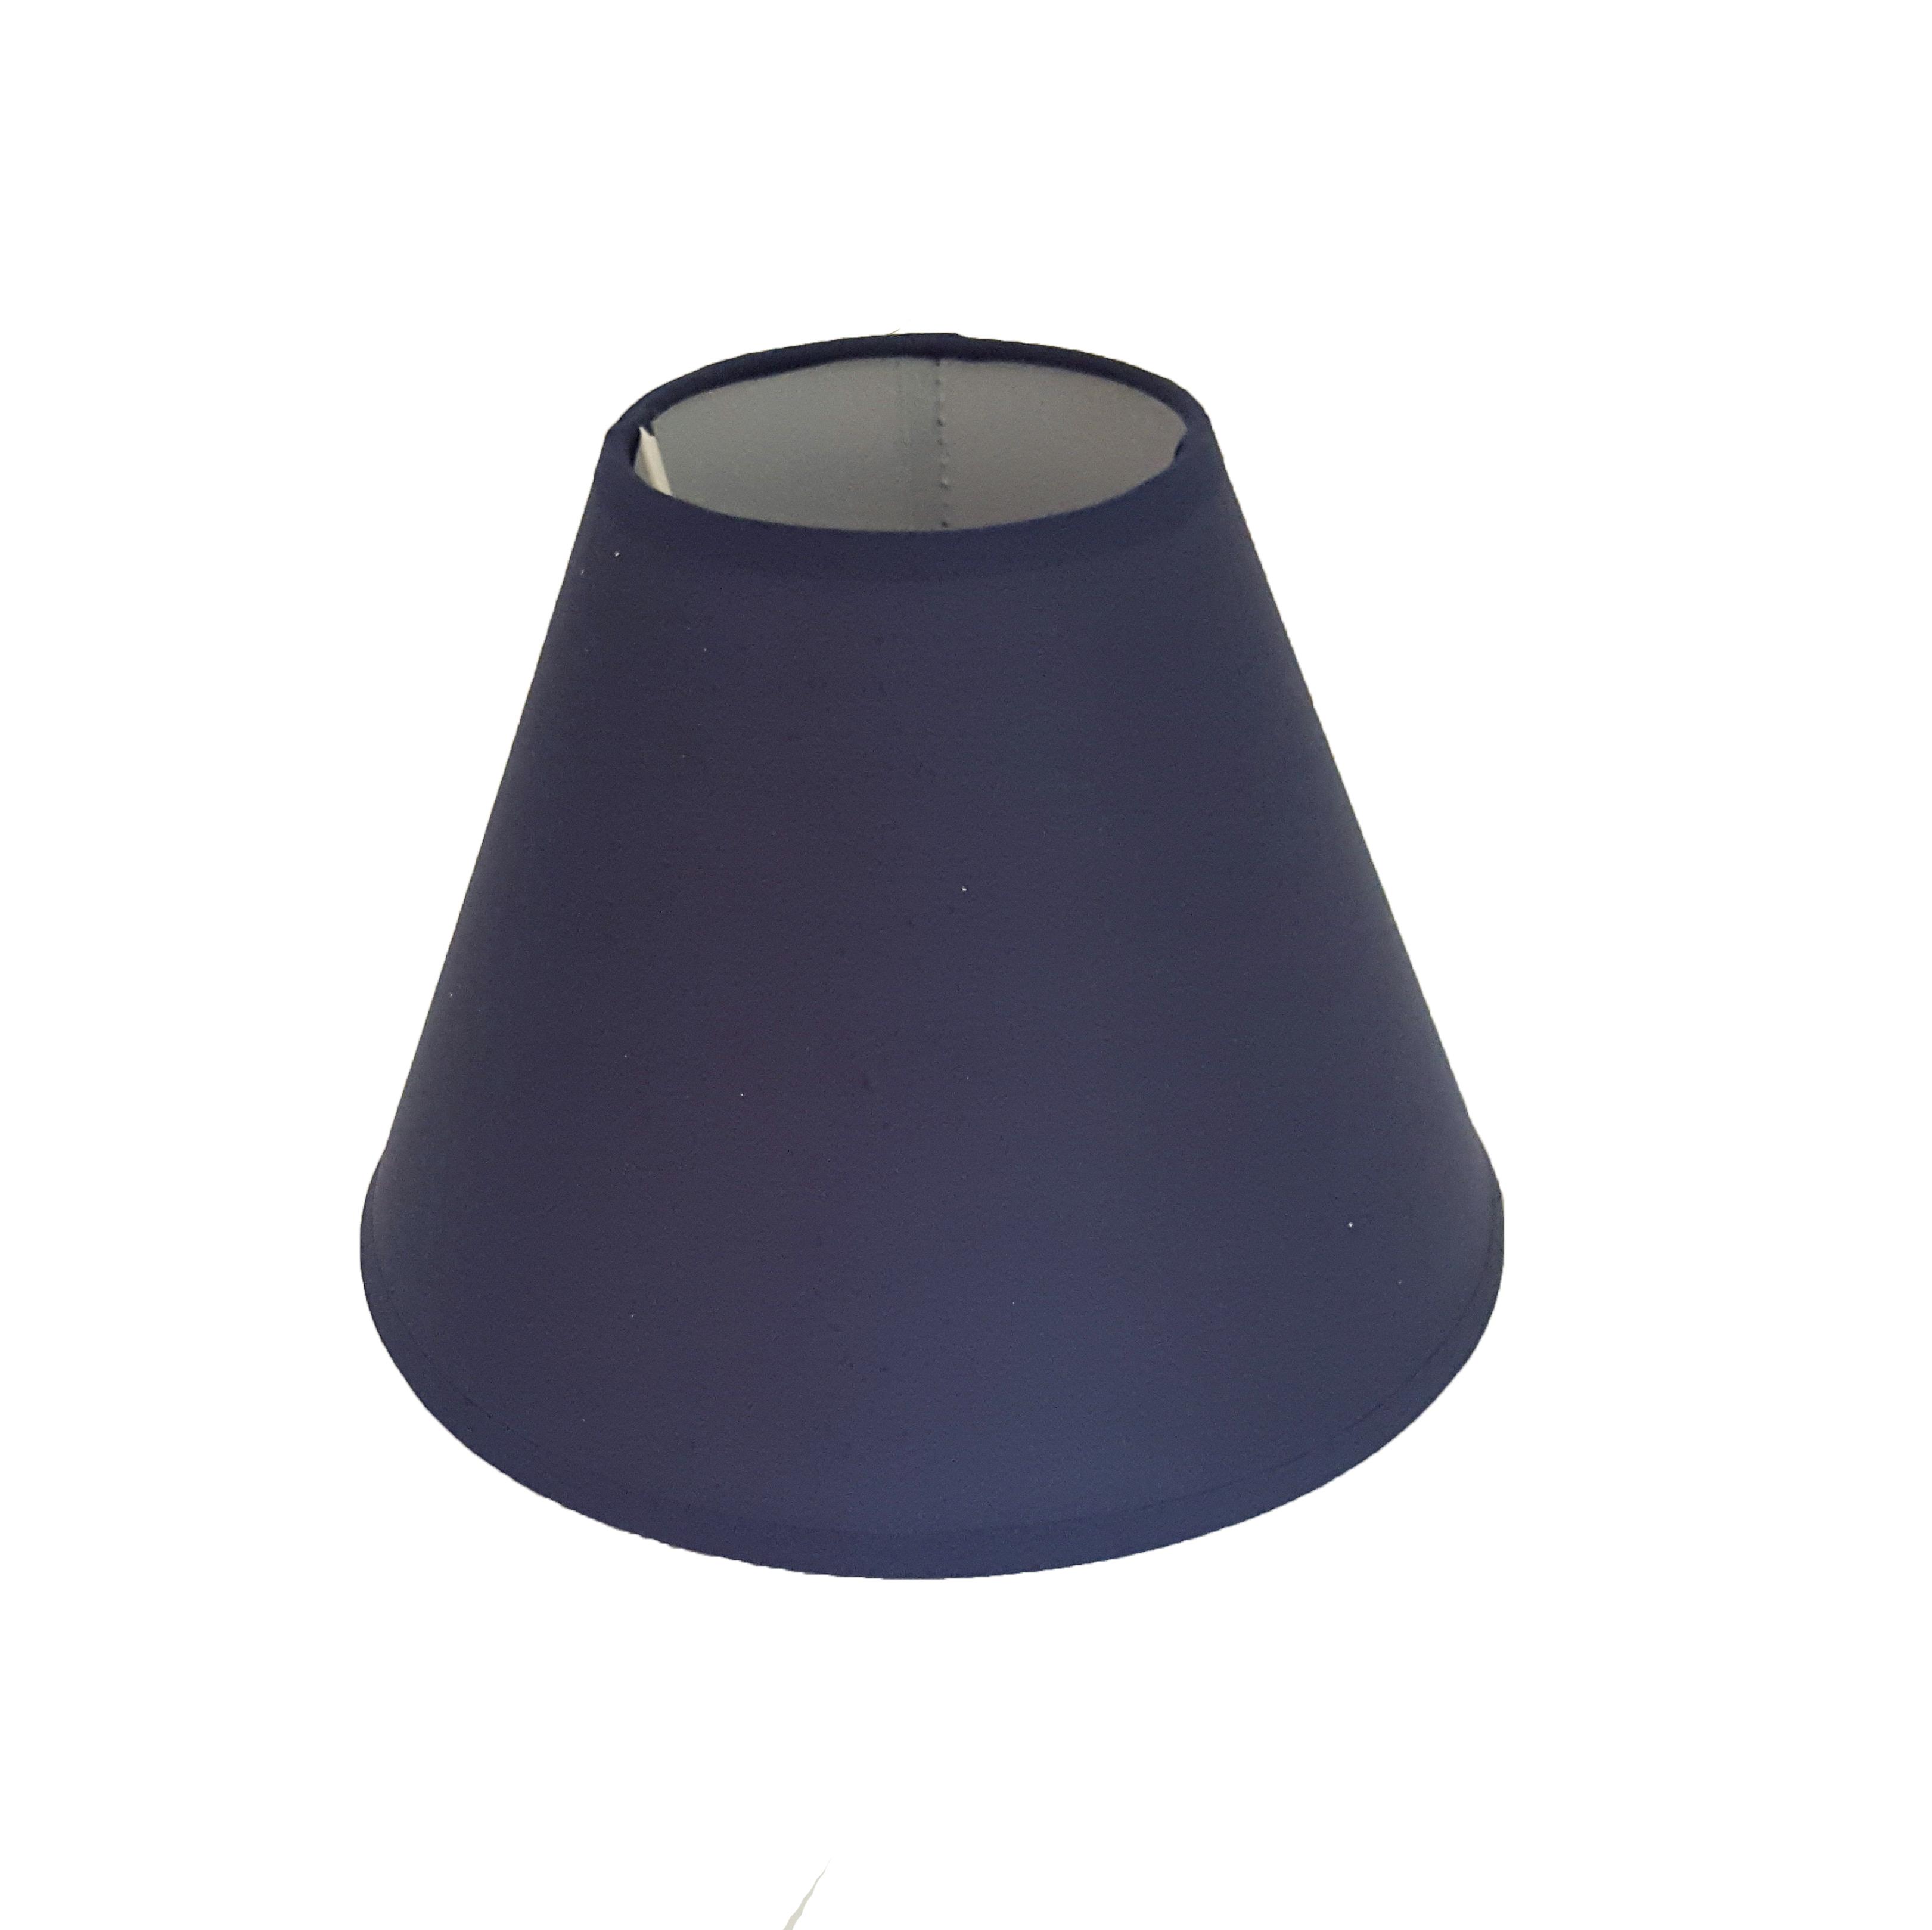 9 Quot Coolie Ceiling Table Lamp Shade Black Cream Lt Blue Lt